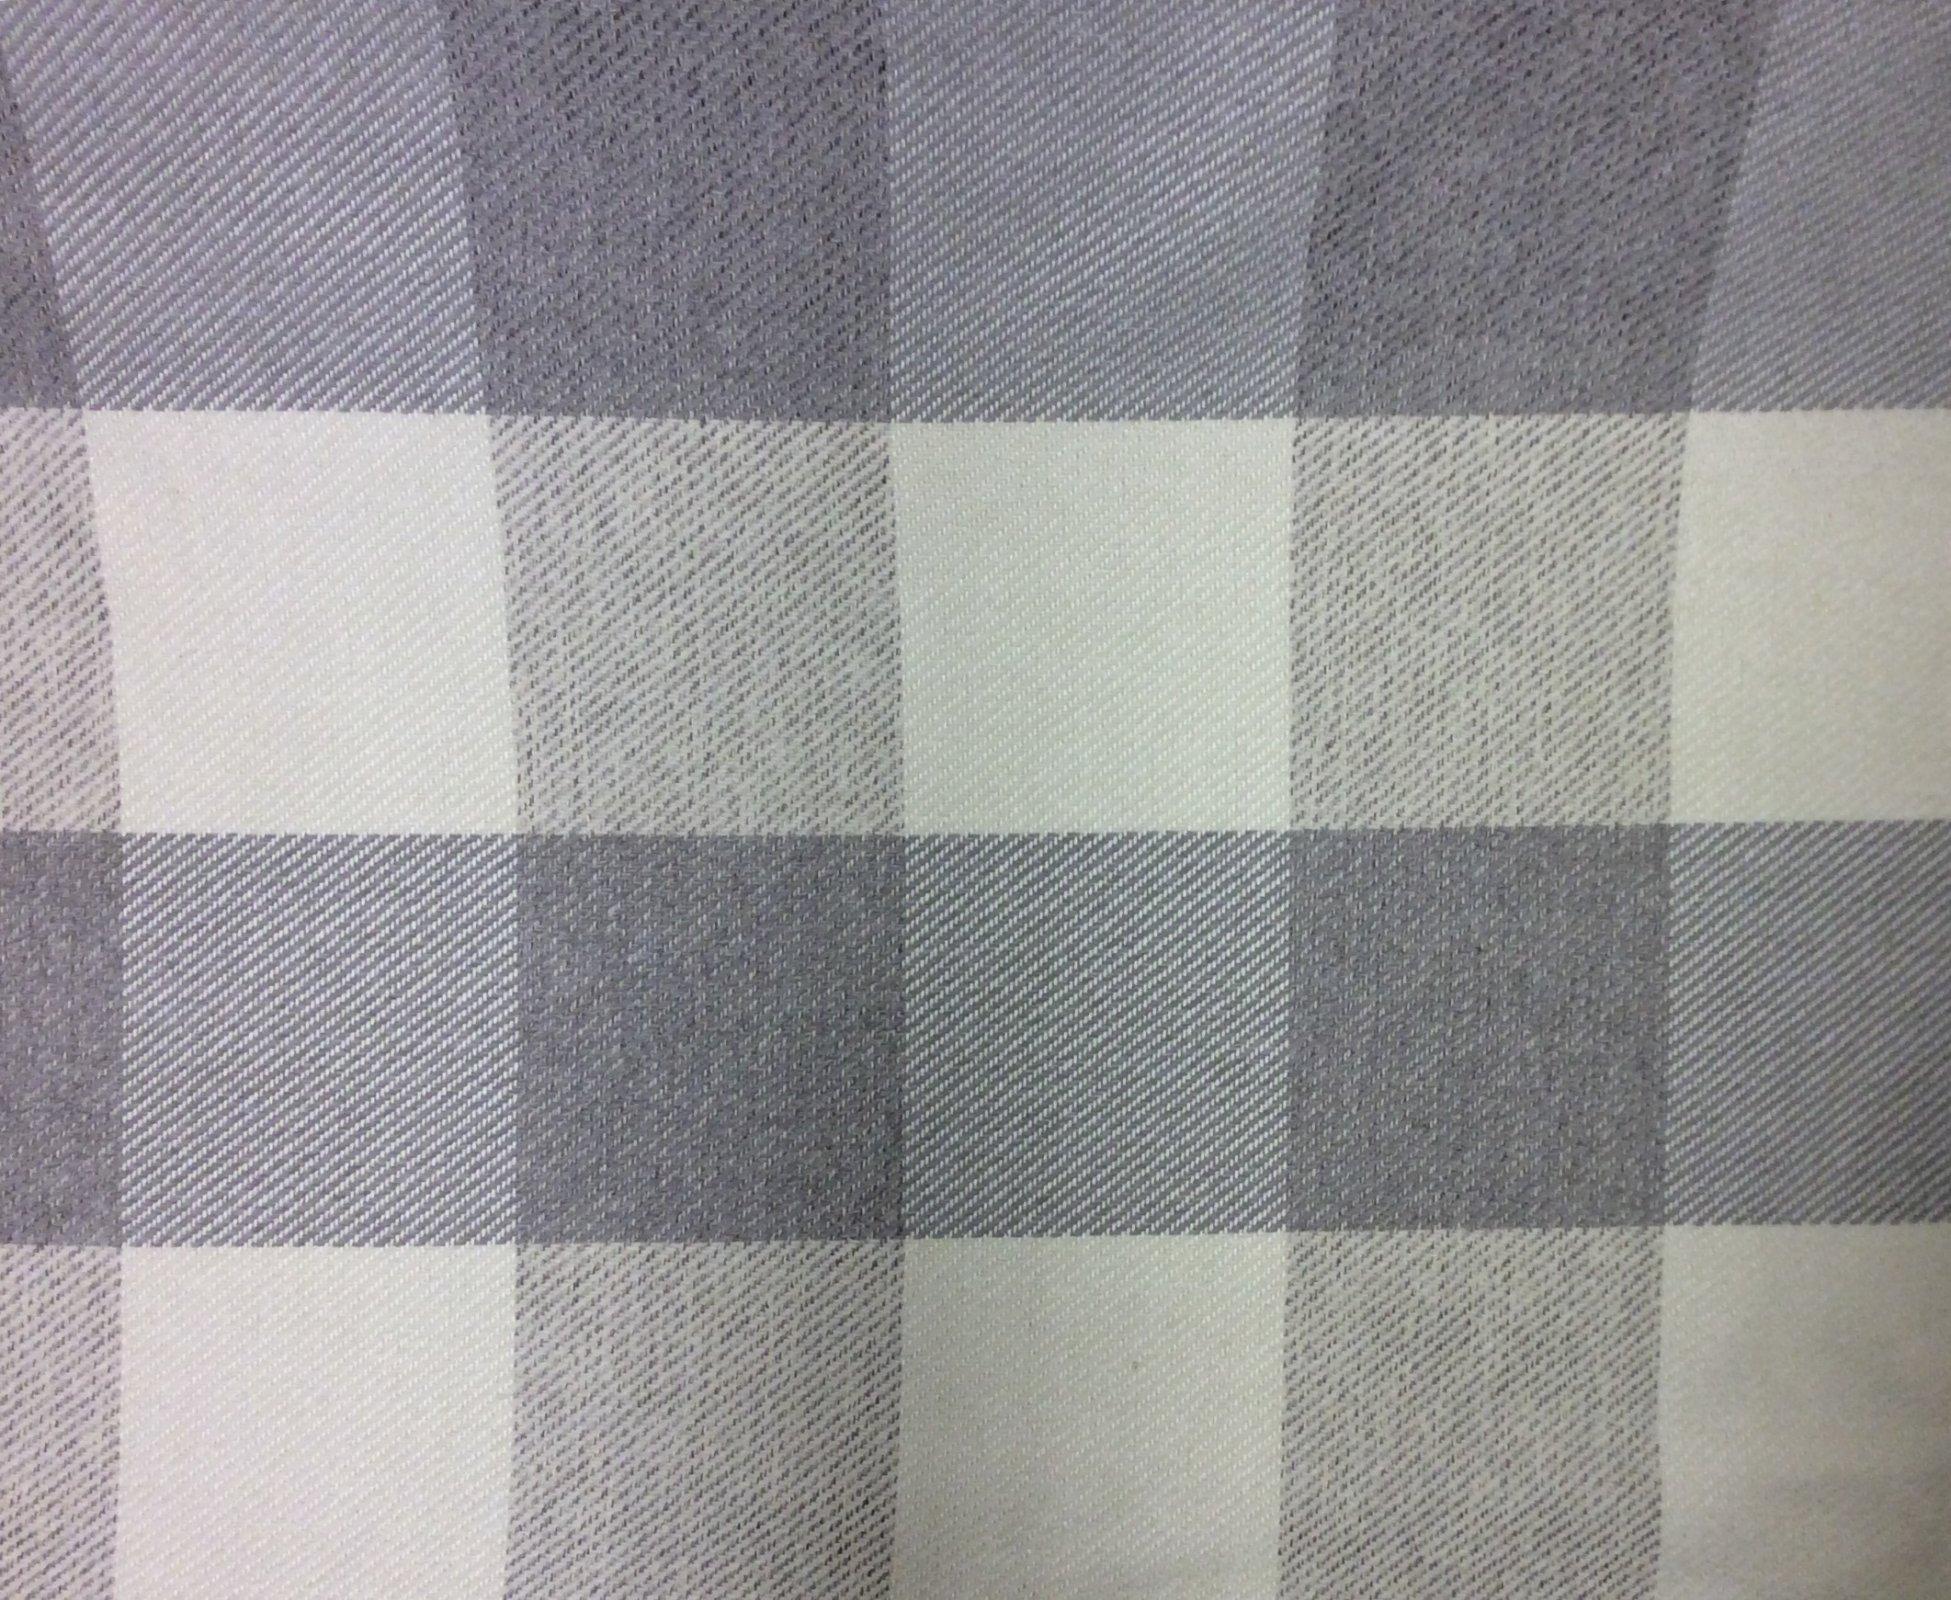 Woven Large Buffalo Check Gray Tone Upholstery Fabric Plaid Home Decor Textile JG734